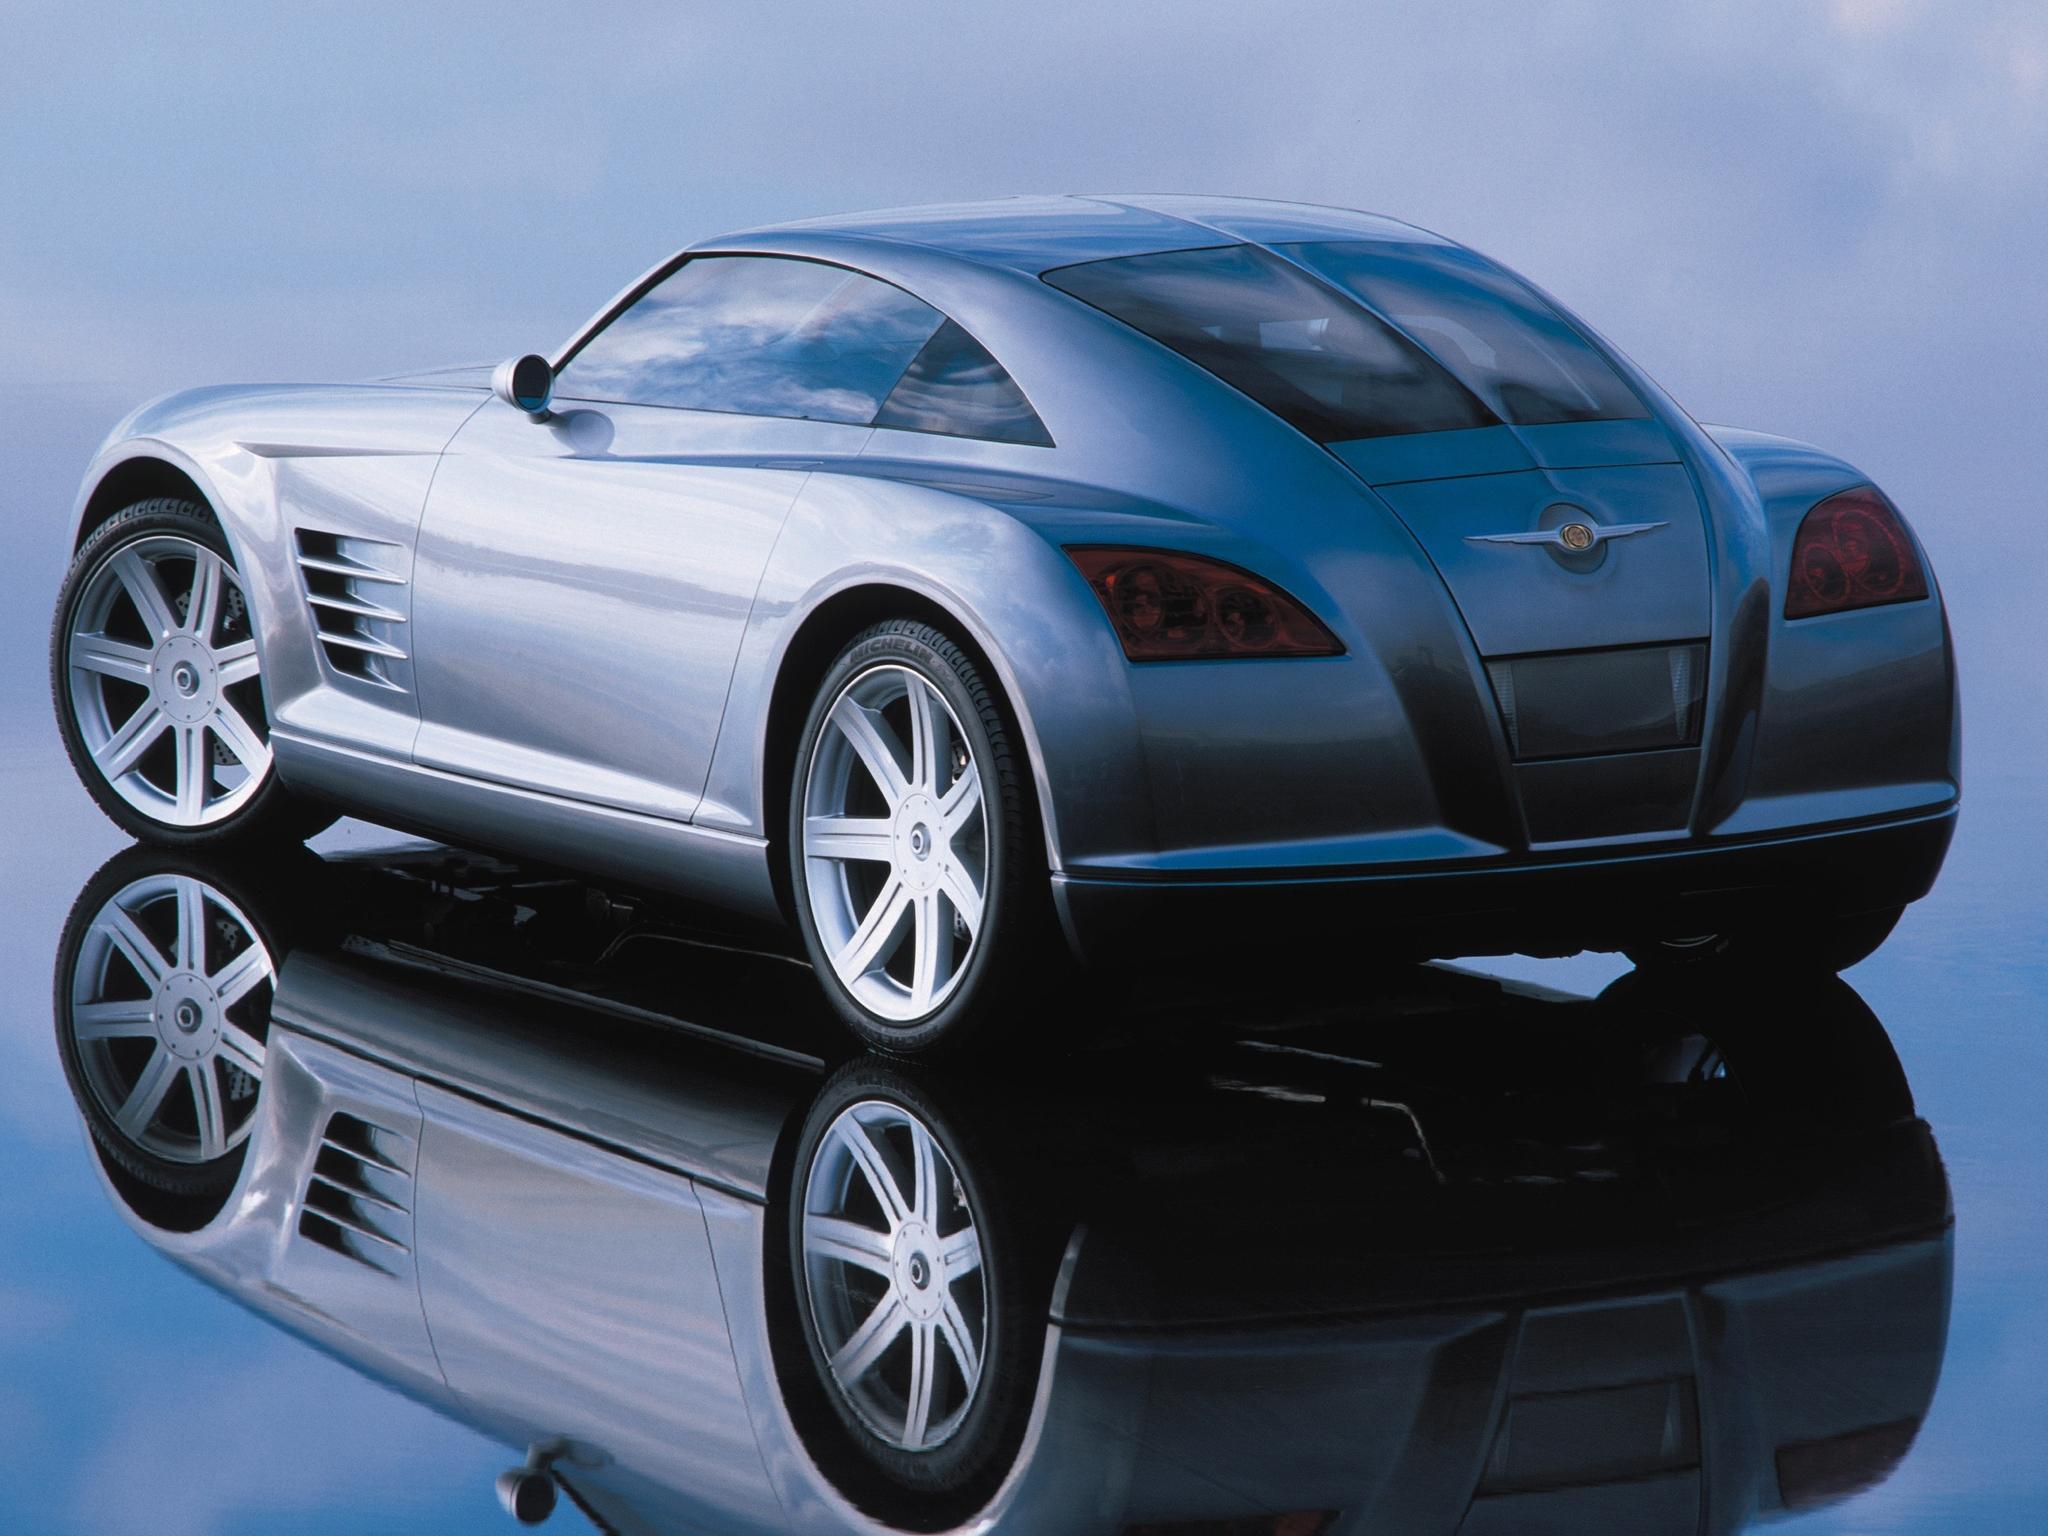 2001 Chrysler Crossfire Concept Car Picture Concept Car ...